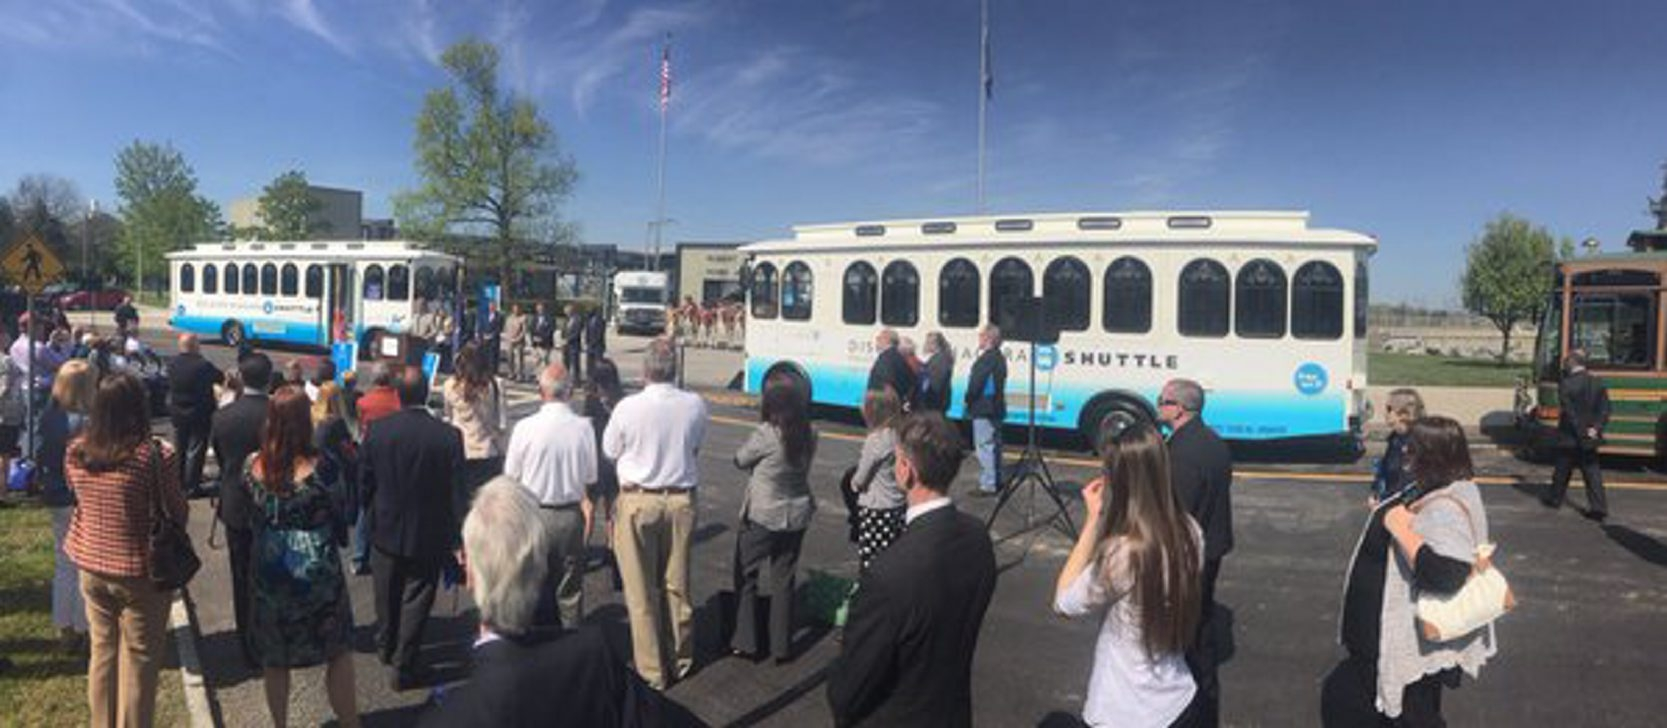 New tourist trolley in Niagara Falls will travel a 14-mile route. (John Hickey/Buffalo News)